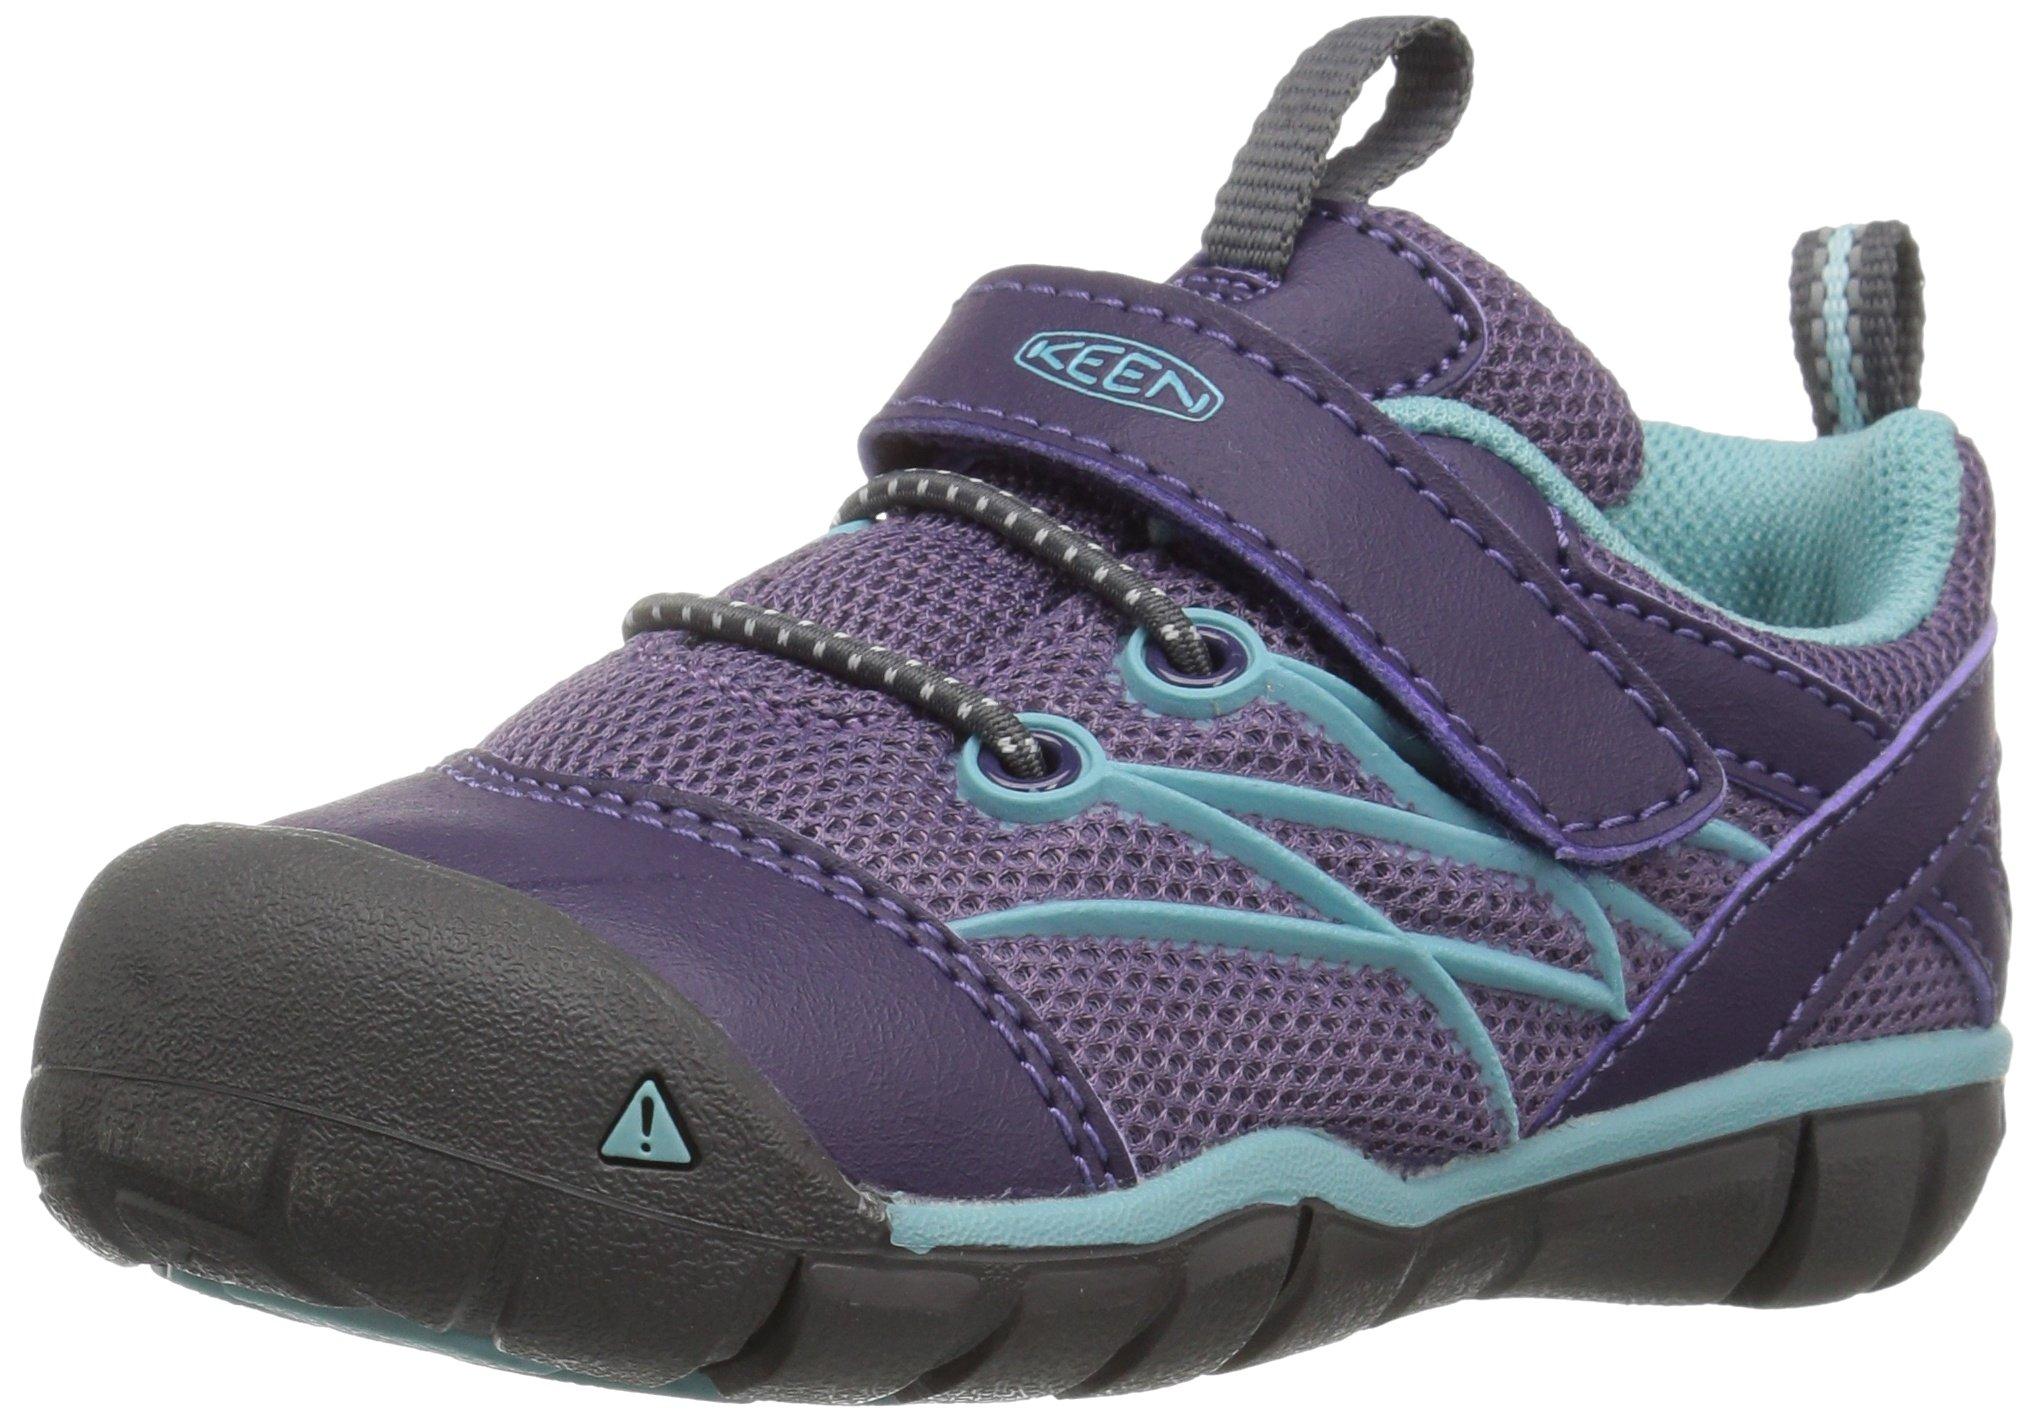 Keen Unisex-Kid's Chandler CNX Hiking Shoe, Montana Grape/Aqua Haze, 4 M US Toddler